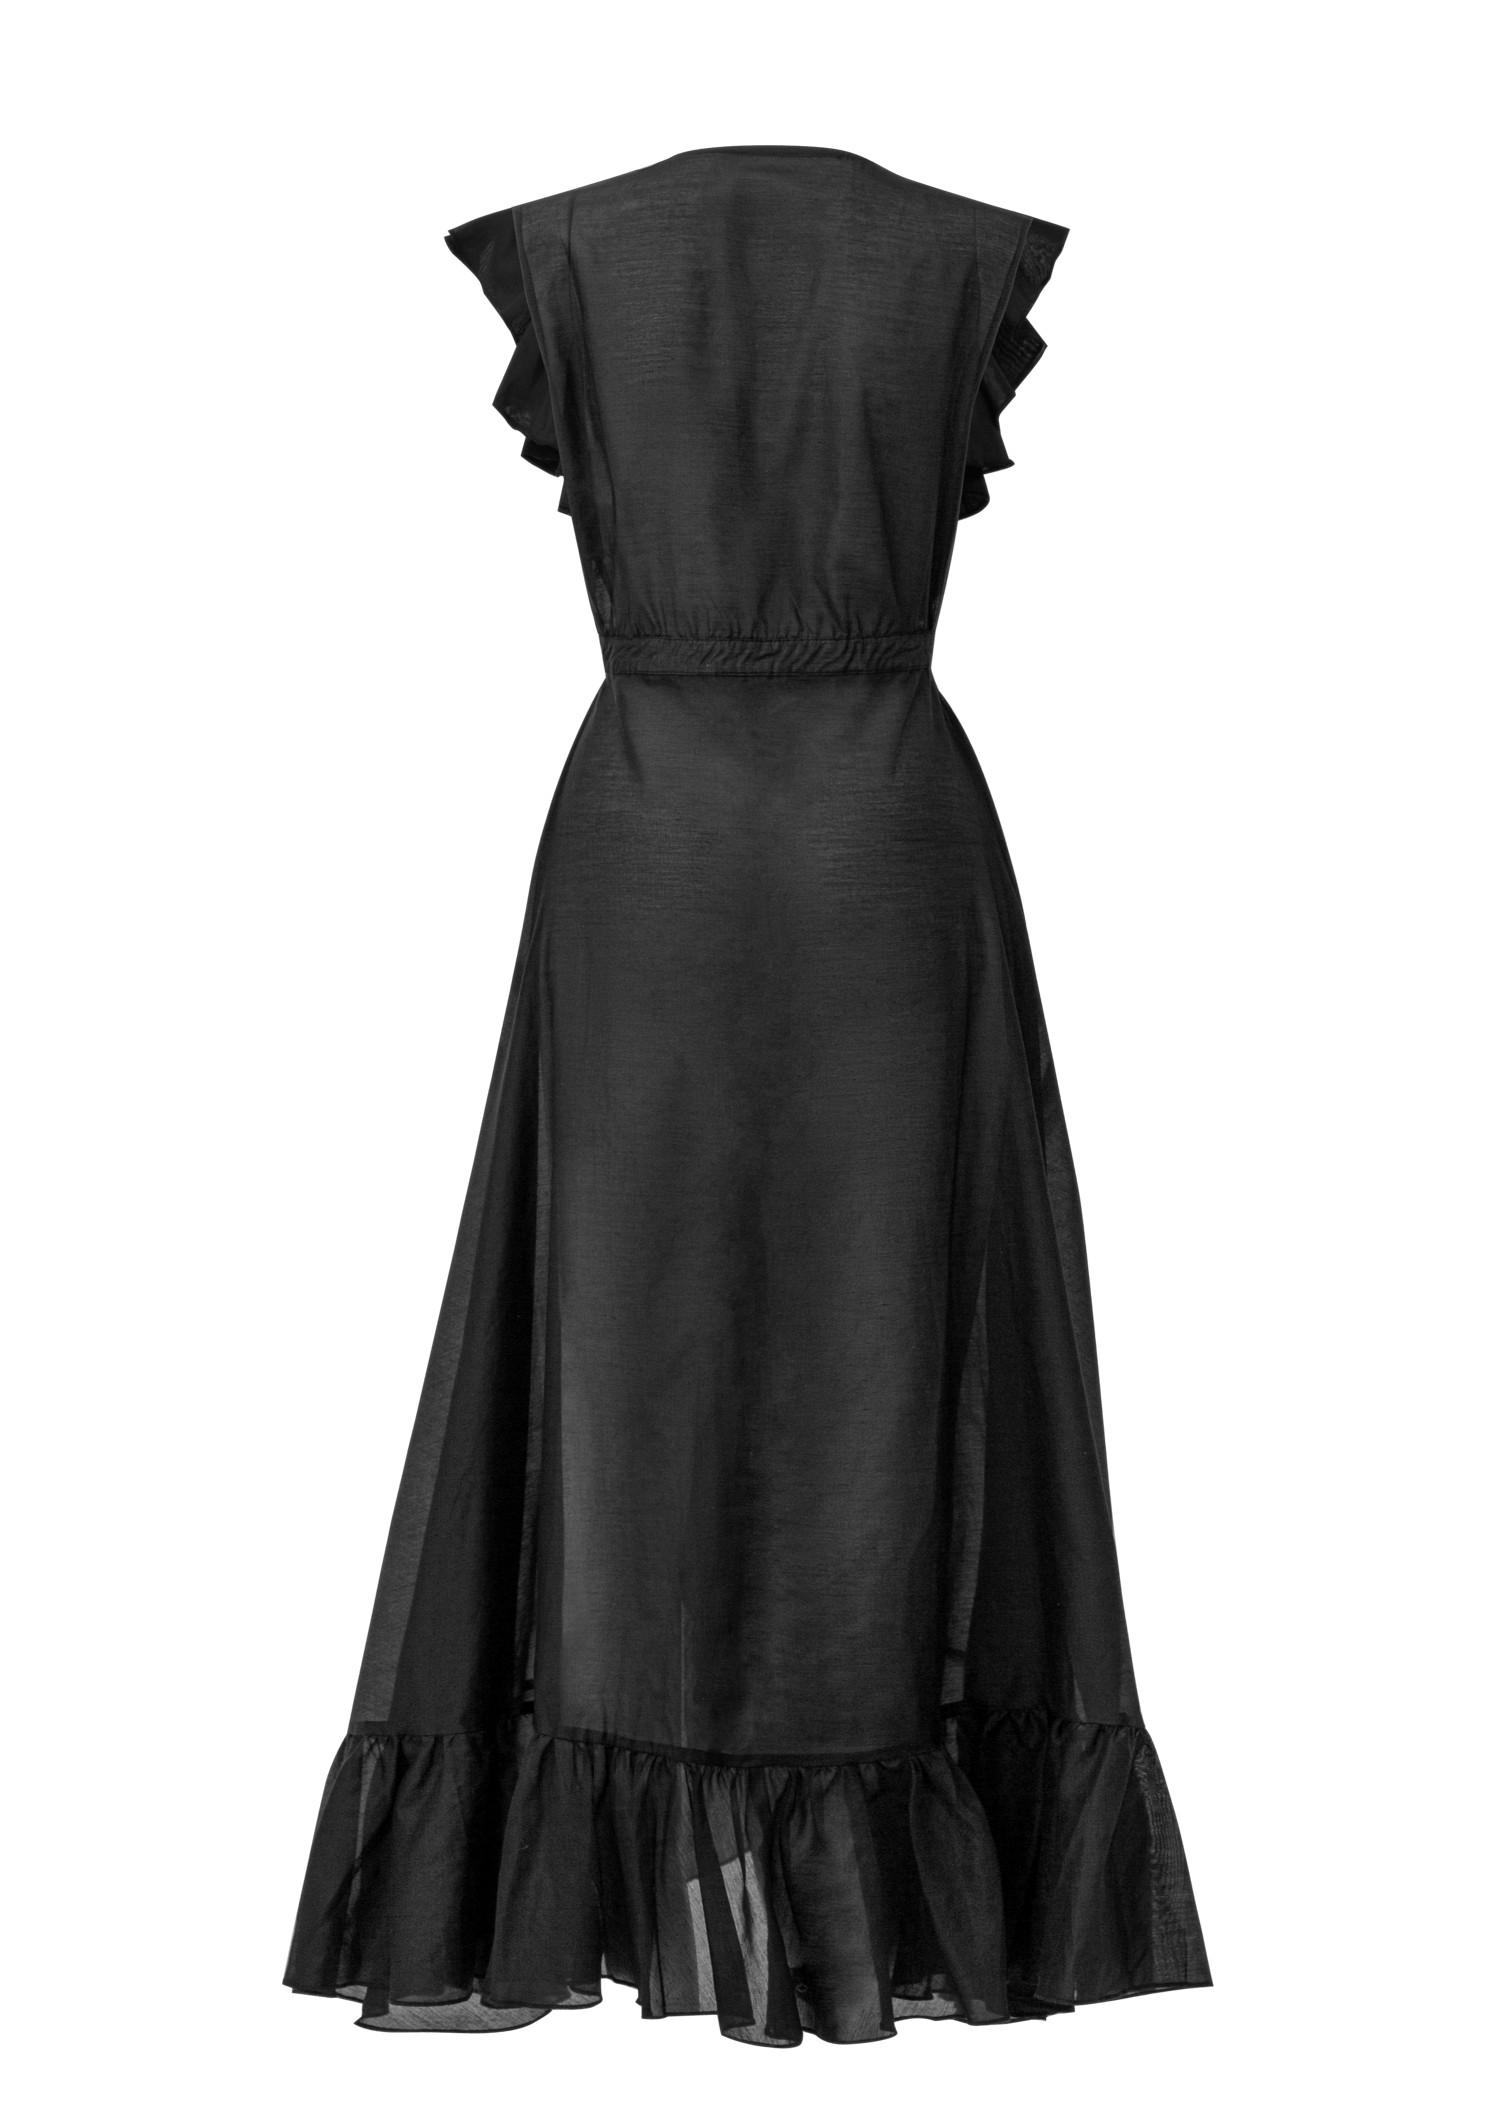 Kate beach dress